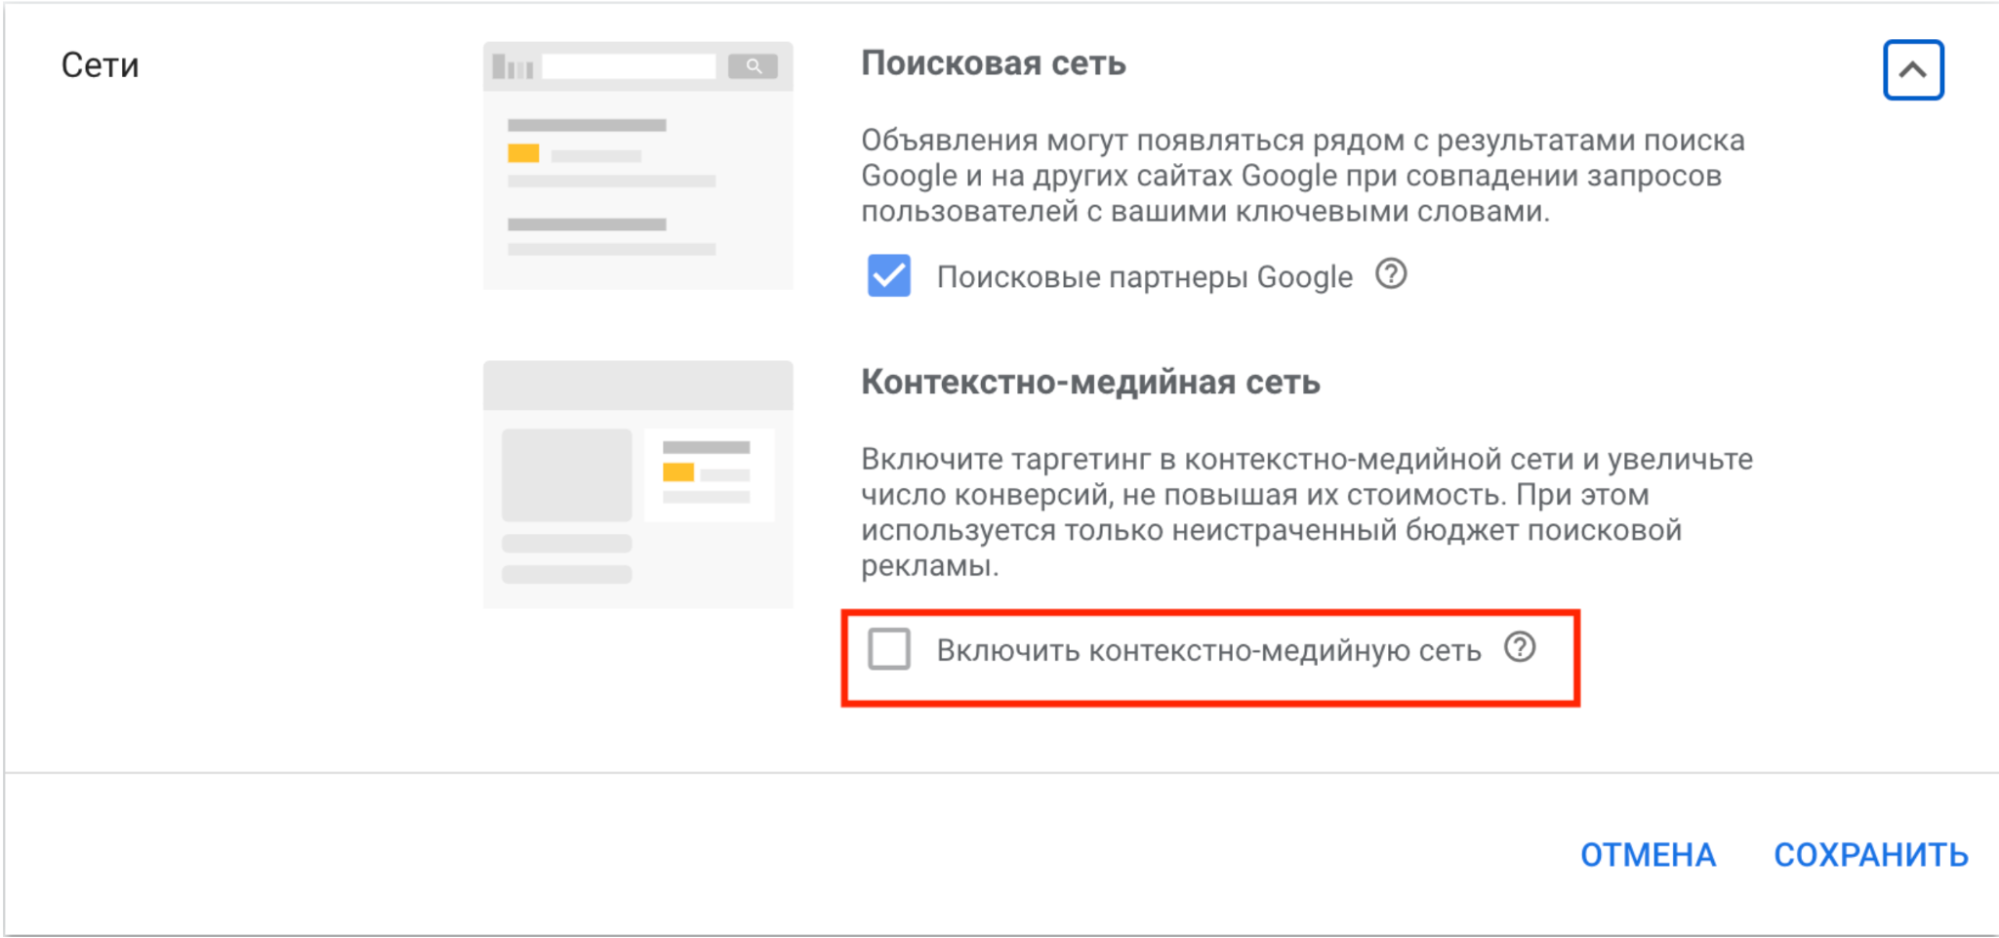 КММ в пошукових кампаніях - помилки в Google Ads